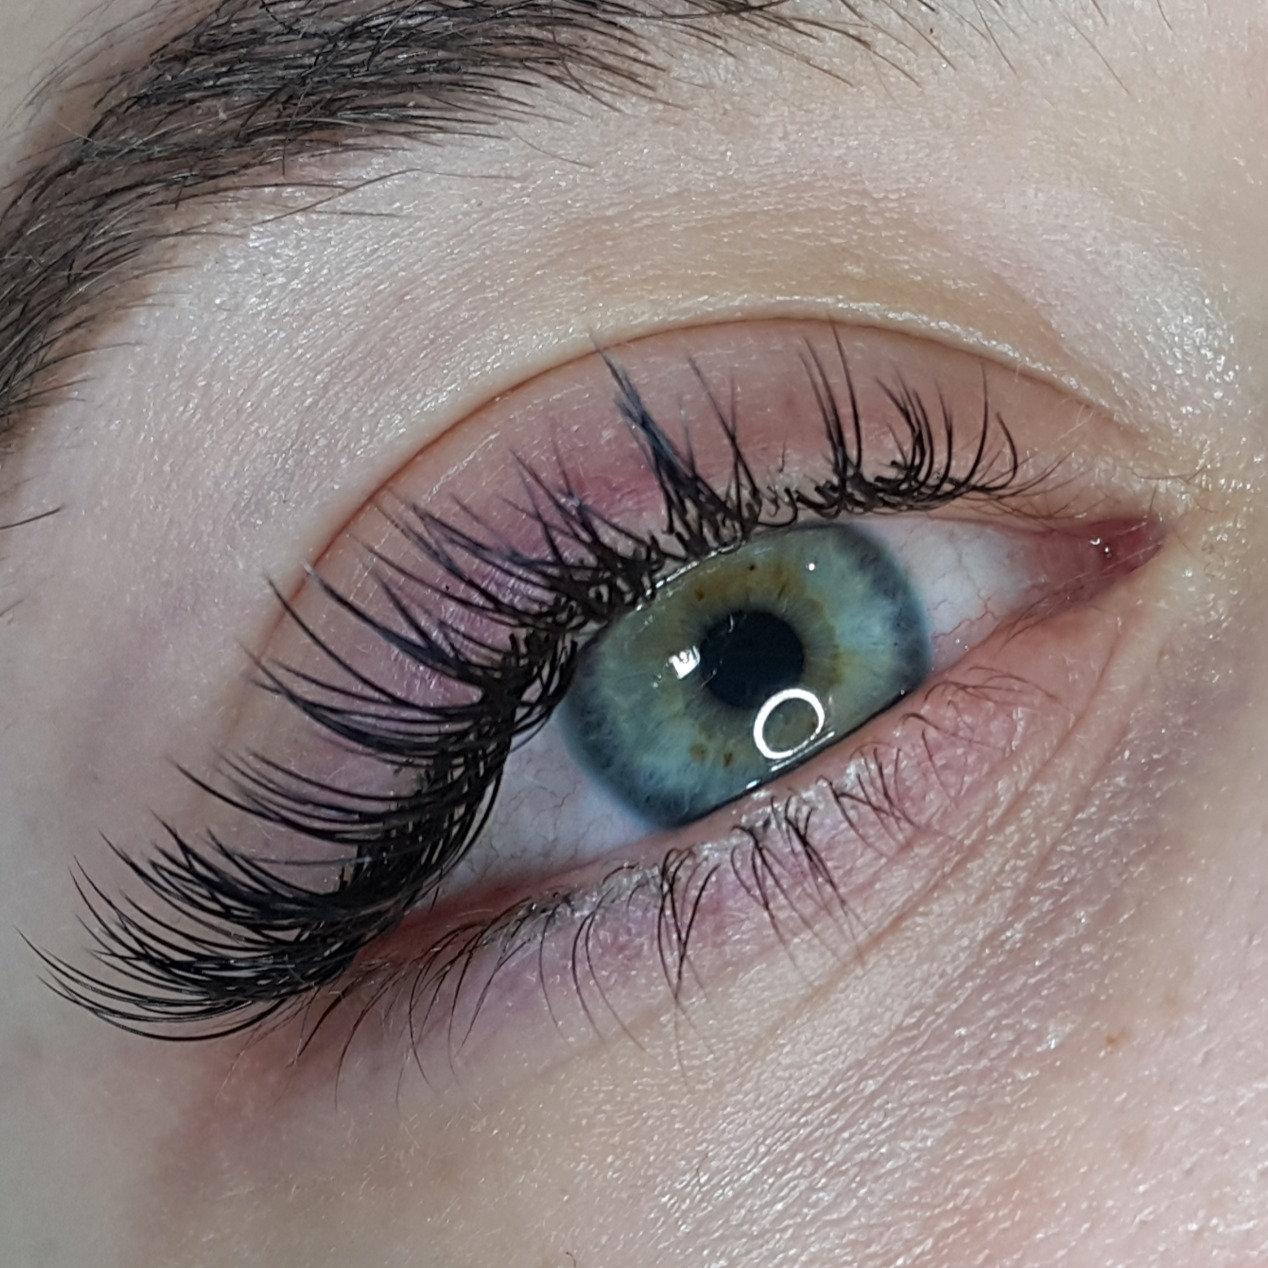 CASHMERE NATURAL SET Eyelash Extensions